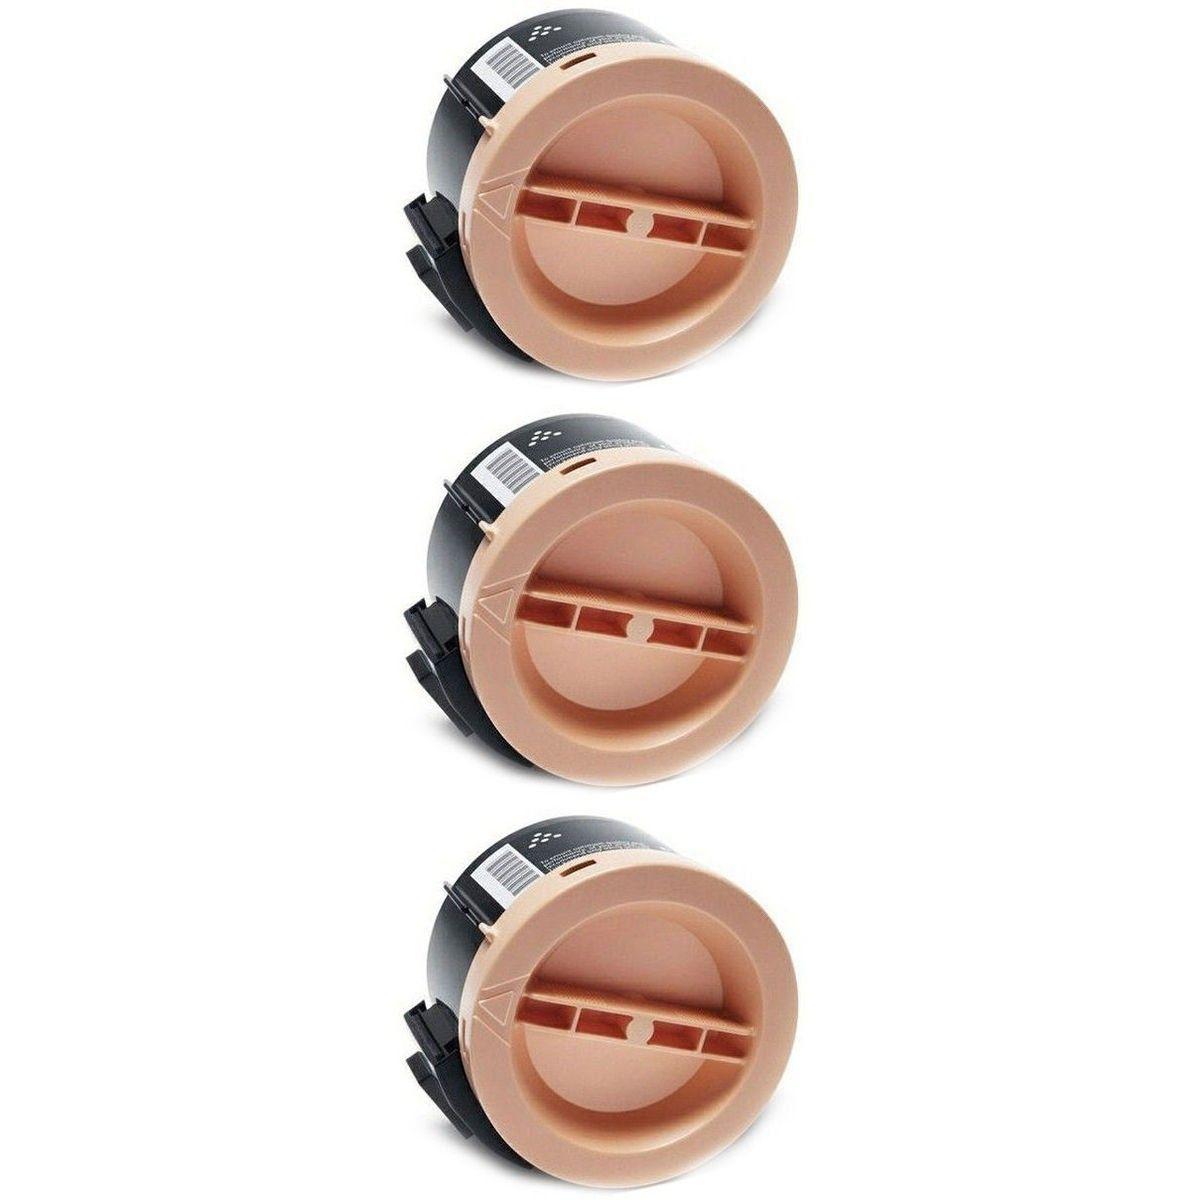 Compatível: Kit 3x Toner X3010H para Xerox Phaser 3010 3040 WorkCentre 3045 3045b 3045ni 3045bno / Preto / 2.200